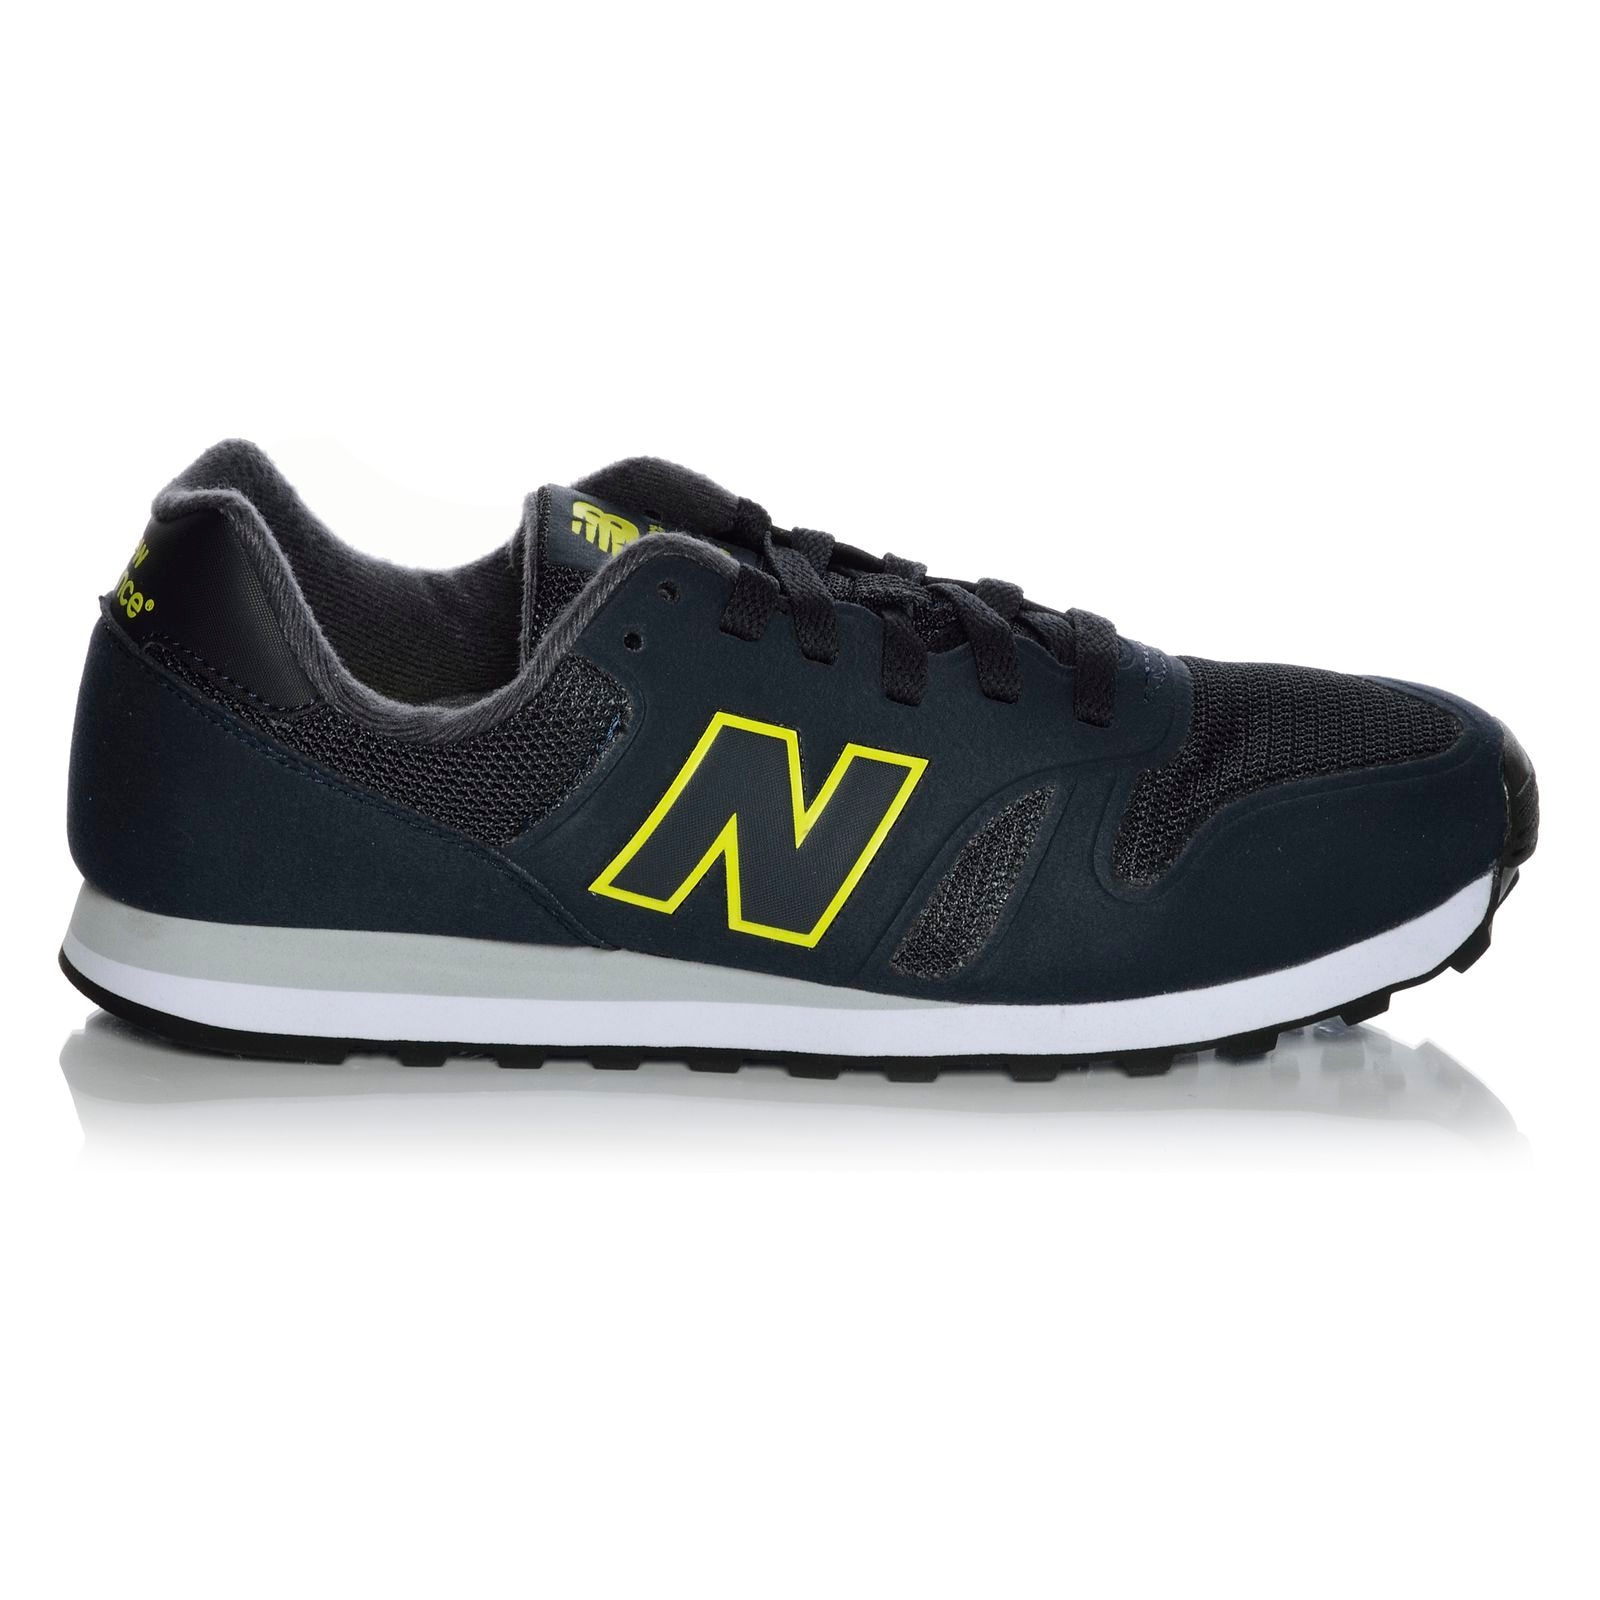 Pantofi sport New Balance Lifestyle Classic 373 MD373NY Barbati Bleumarin 40.5